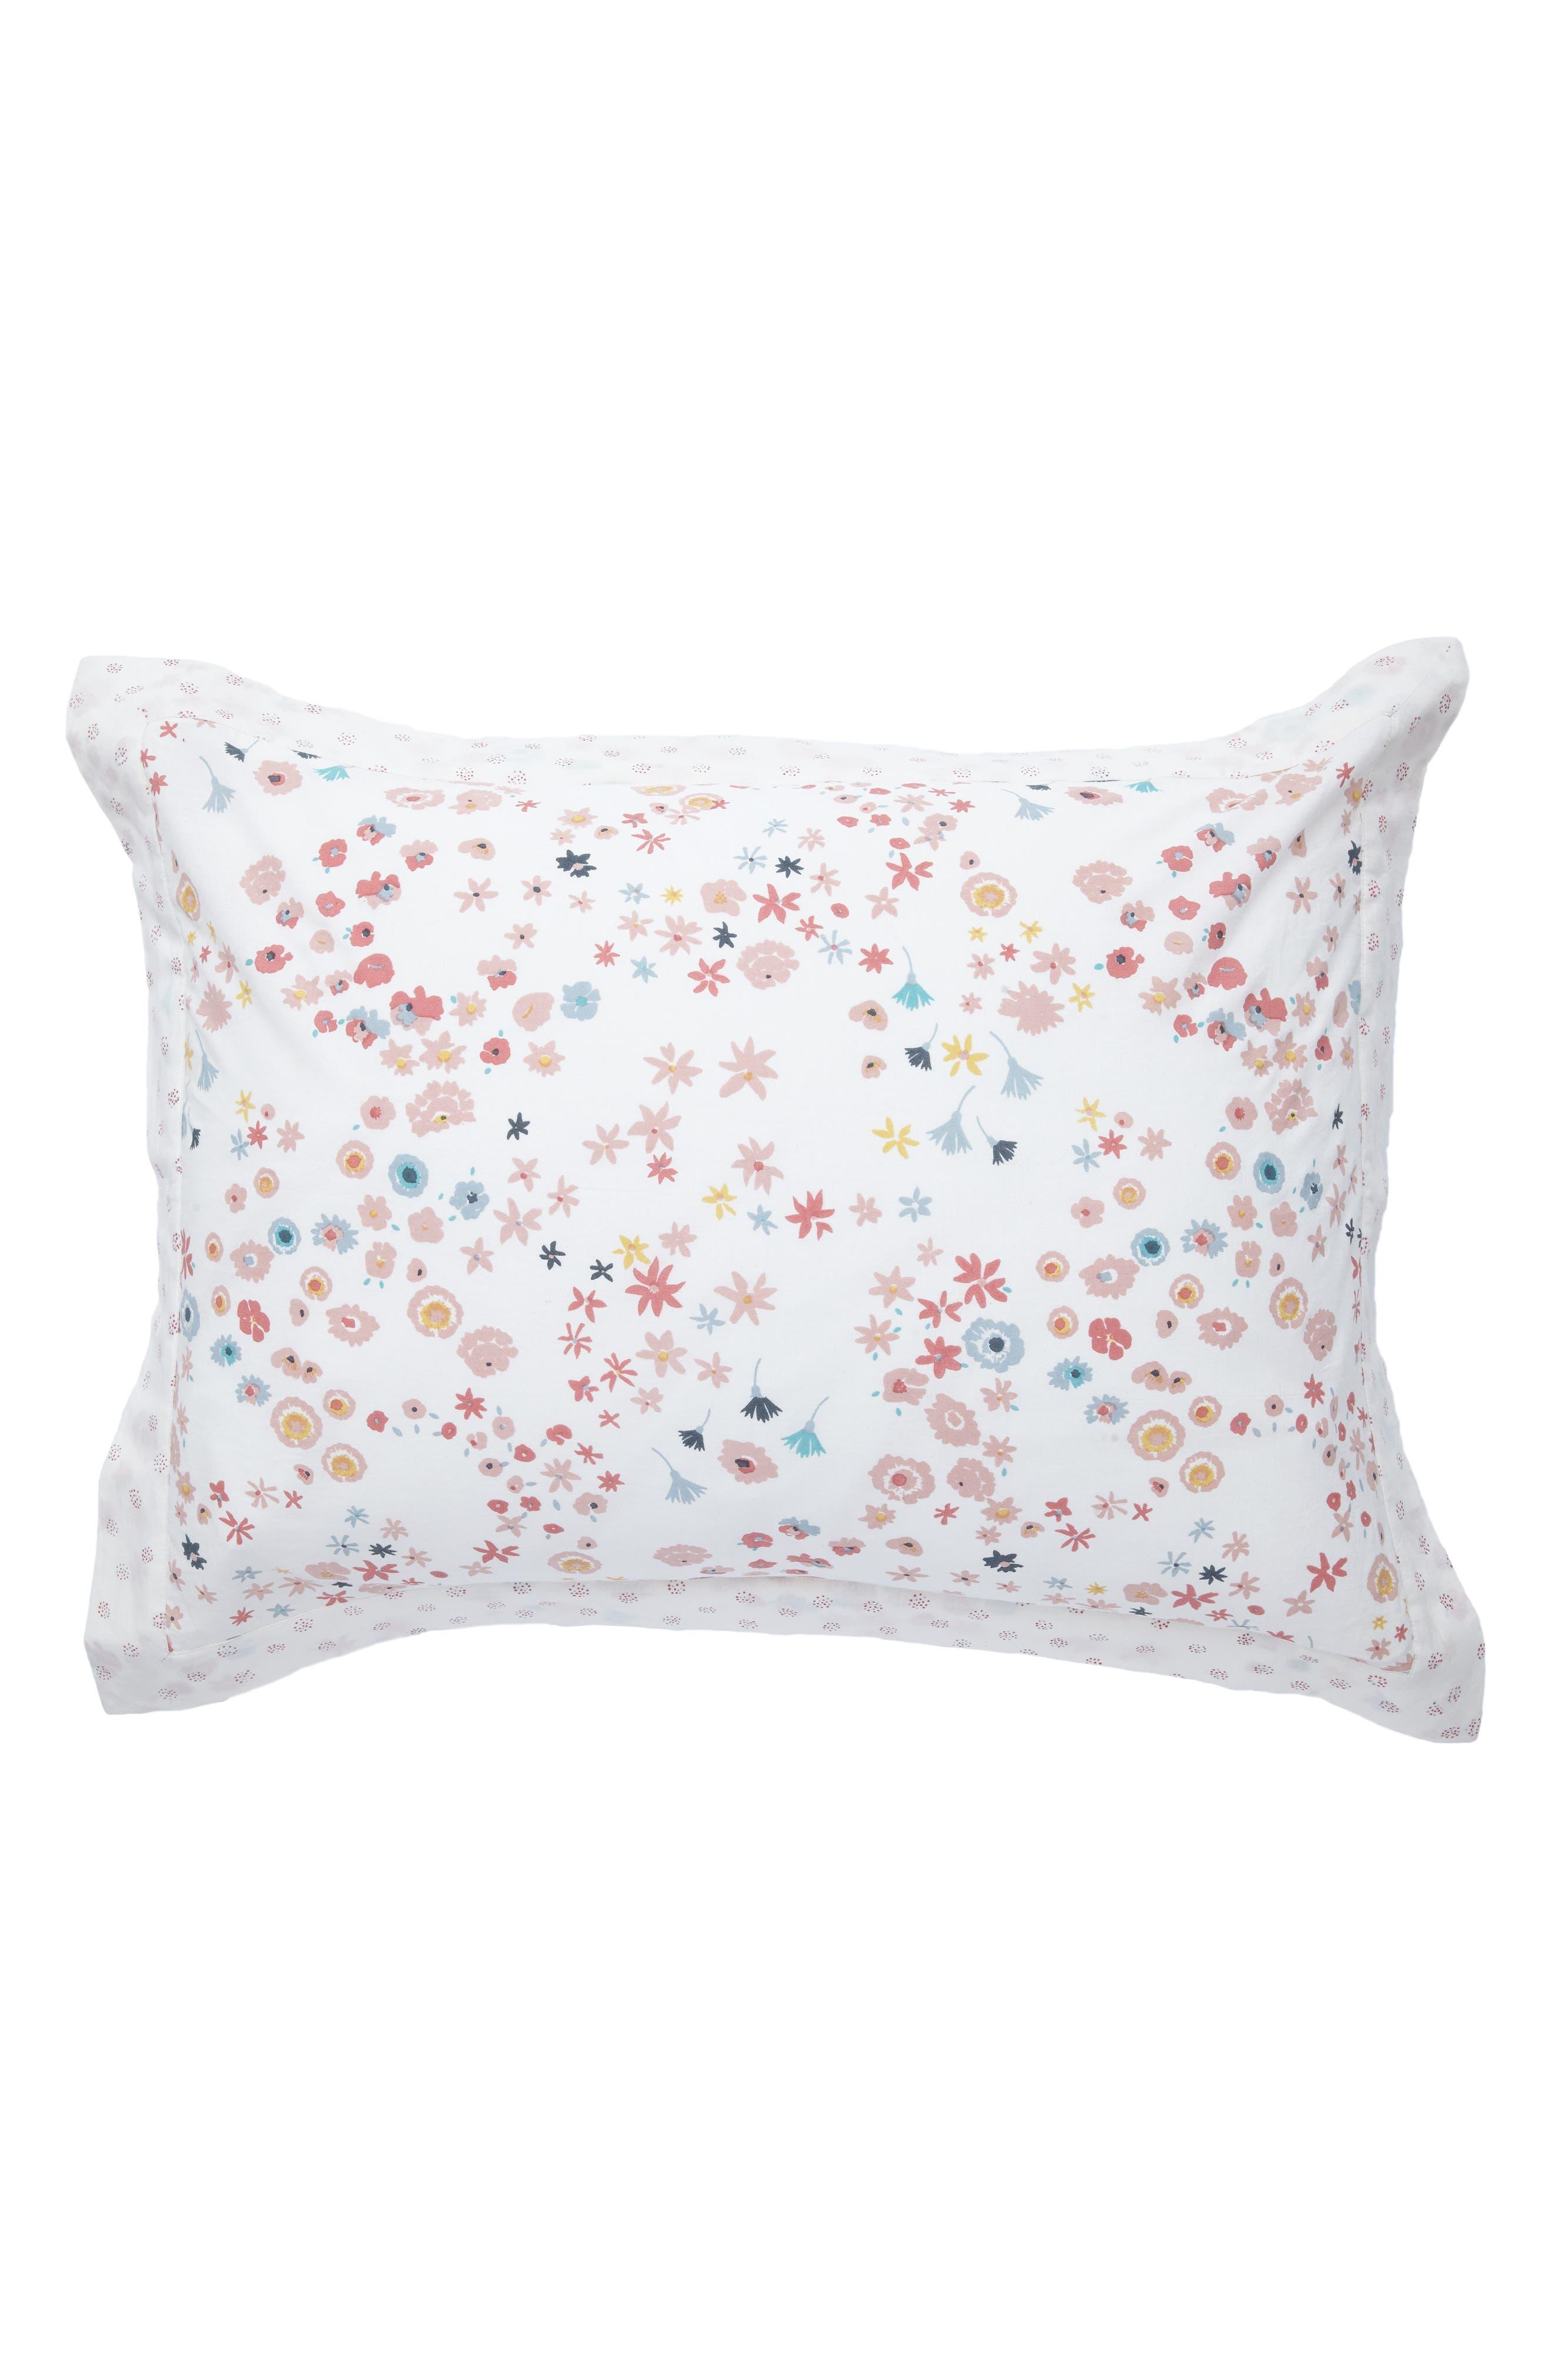 Reversible Standard Pillow Sham,                             Main thumbnail 1, color,                             650